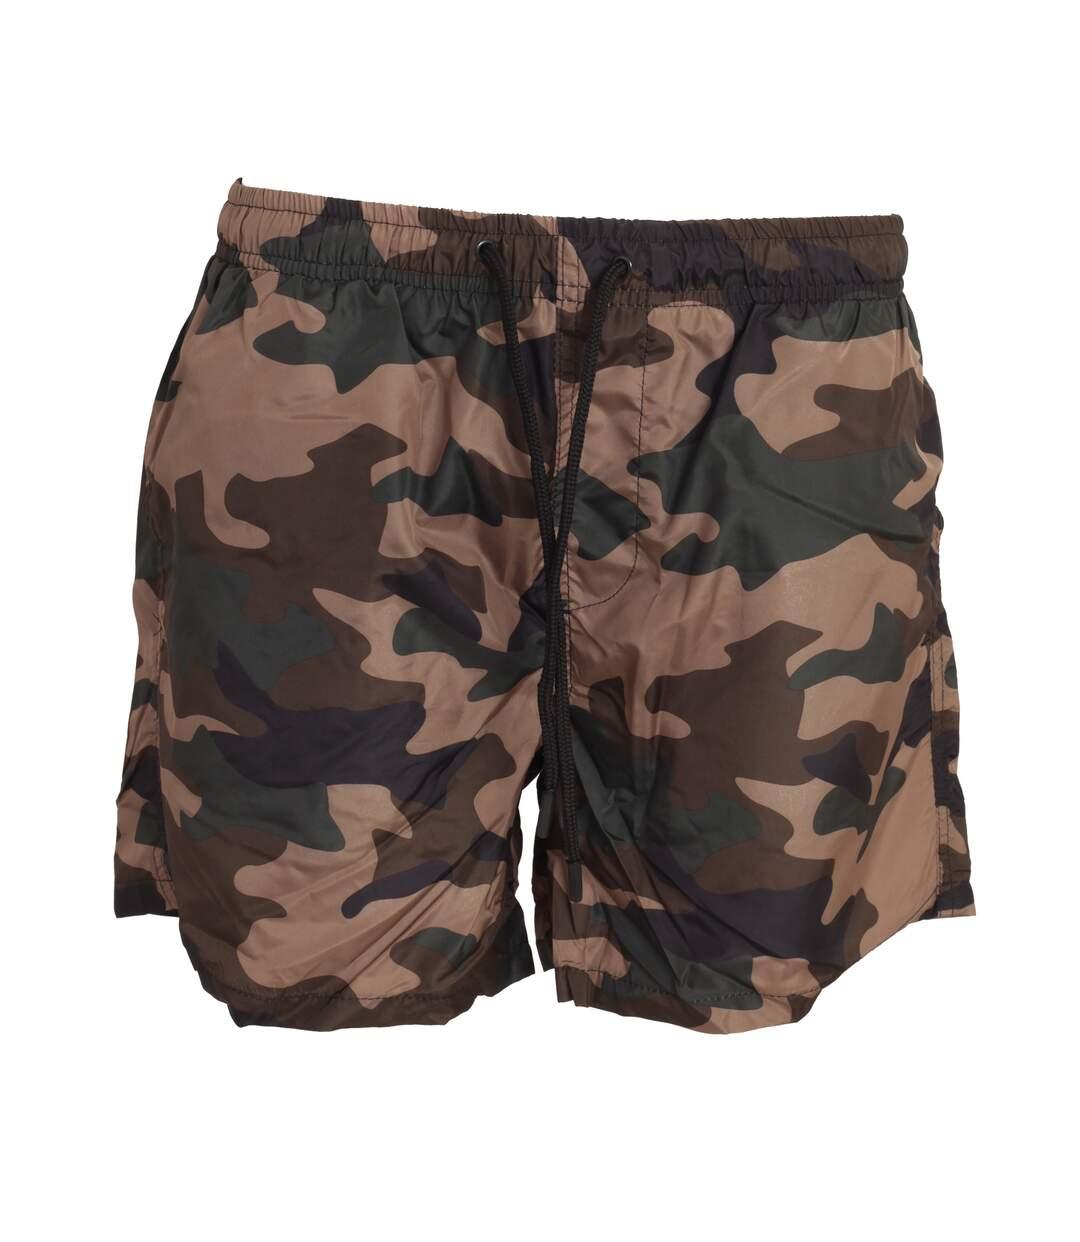 Brave Soul Mens Camouflage Print Swim Shorts (Khaki Camo) - UTSWIM650